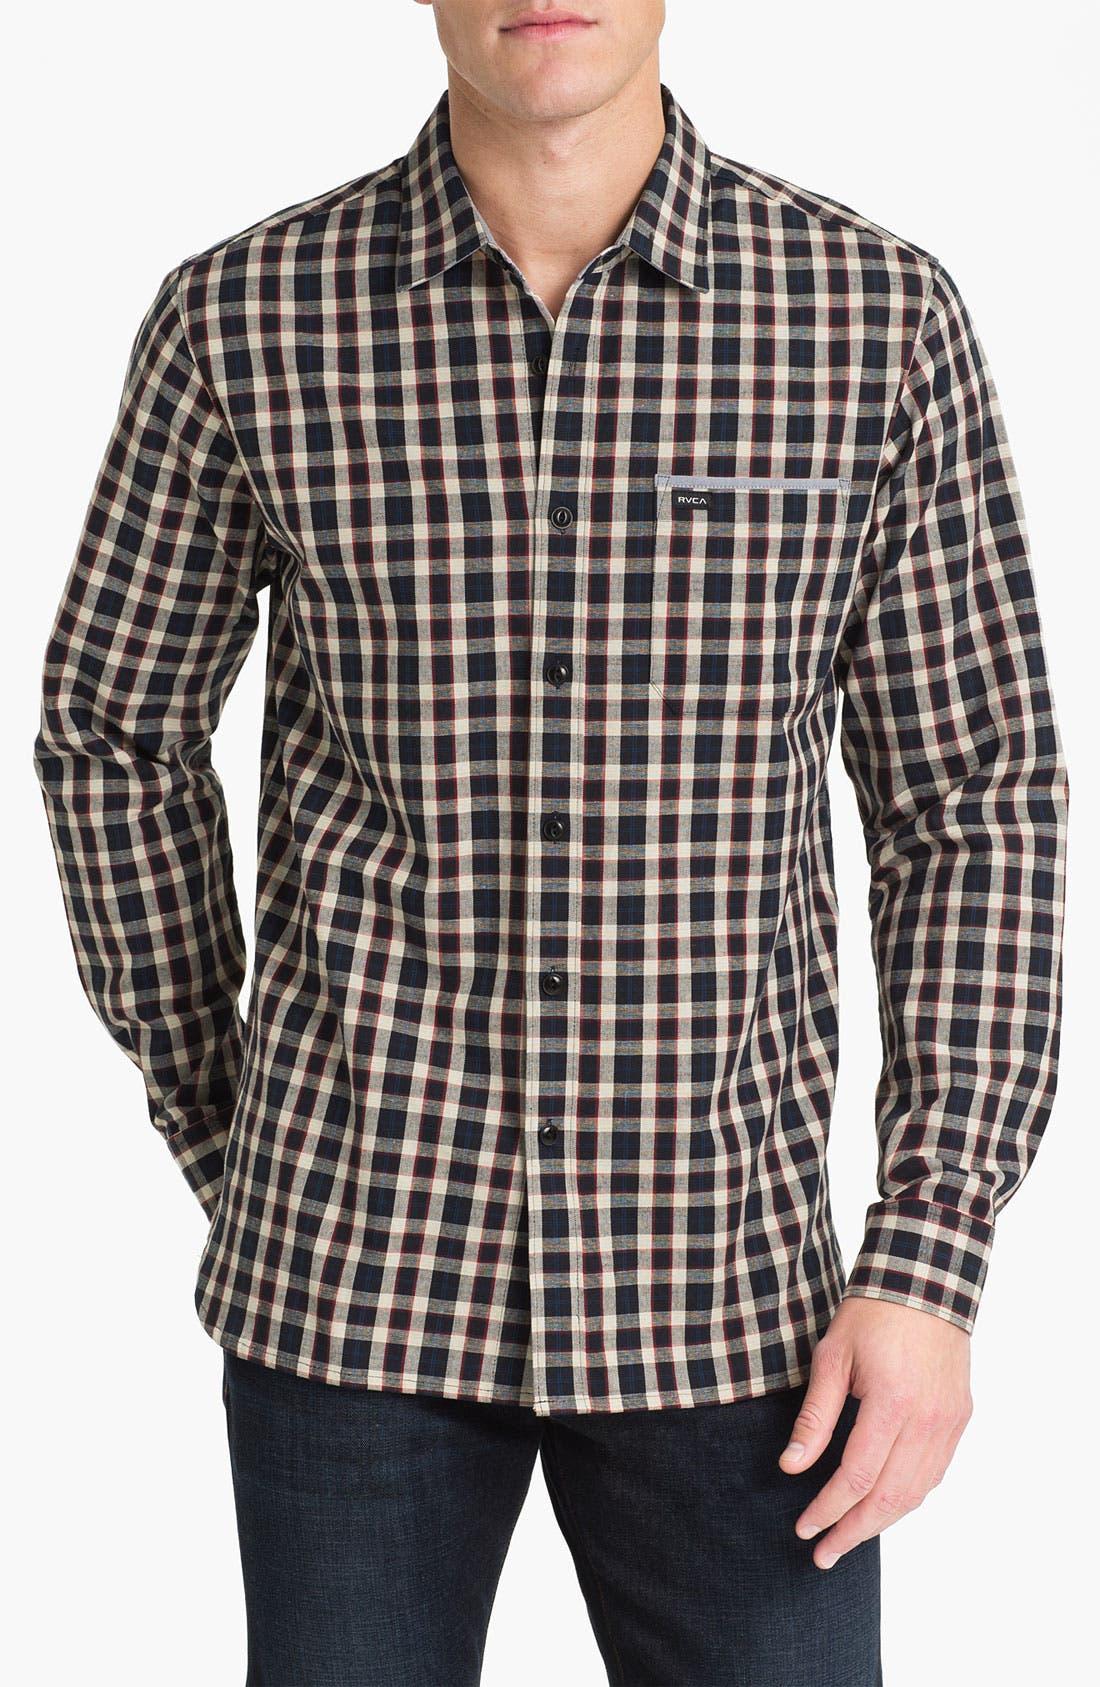 Main Image - RVCA 'Portman' Woven Shirt